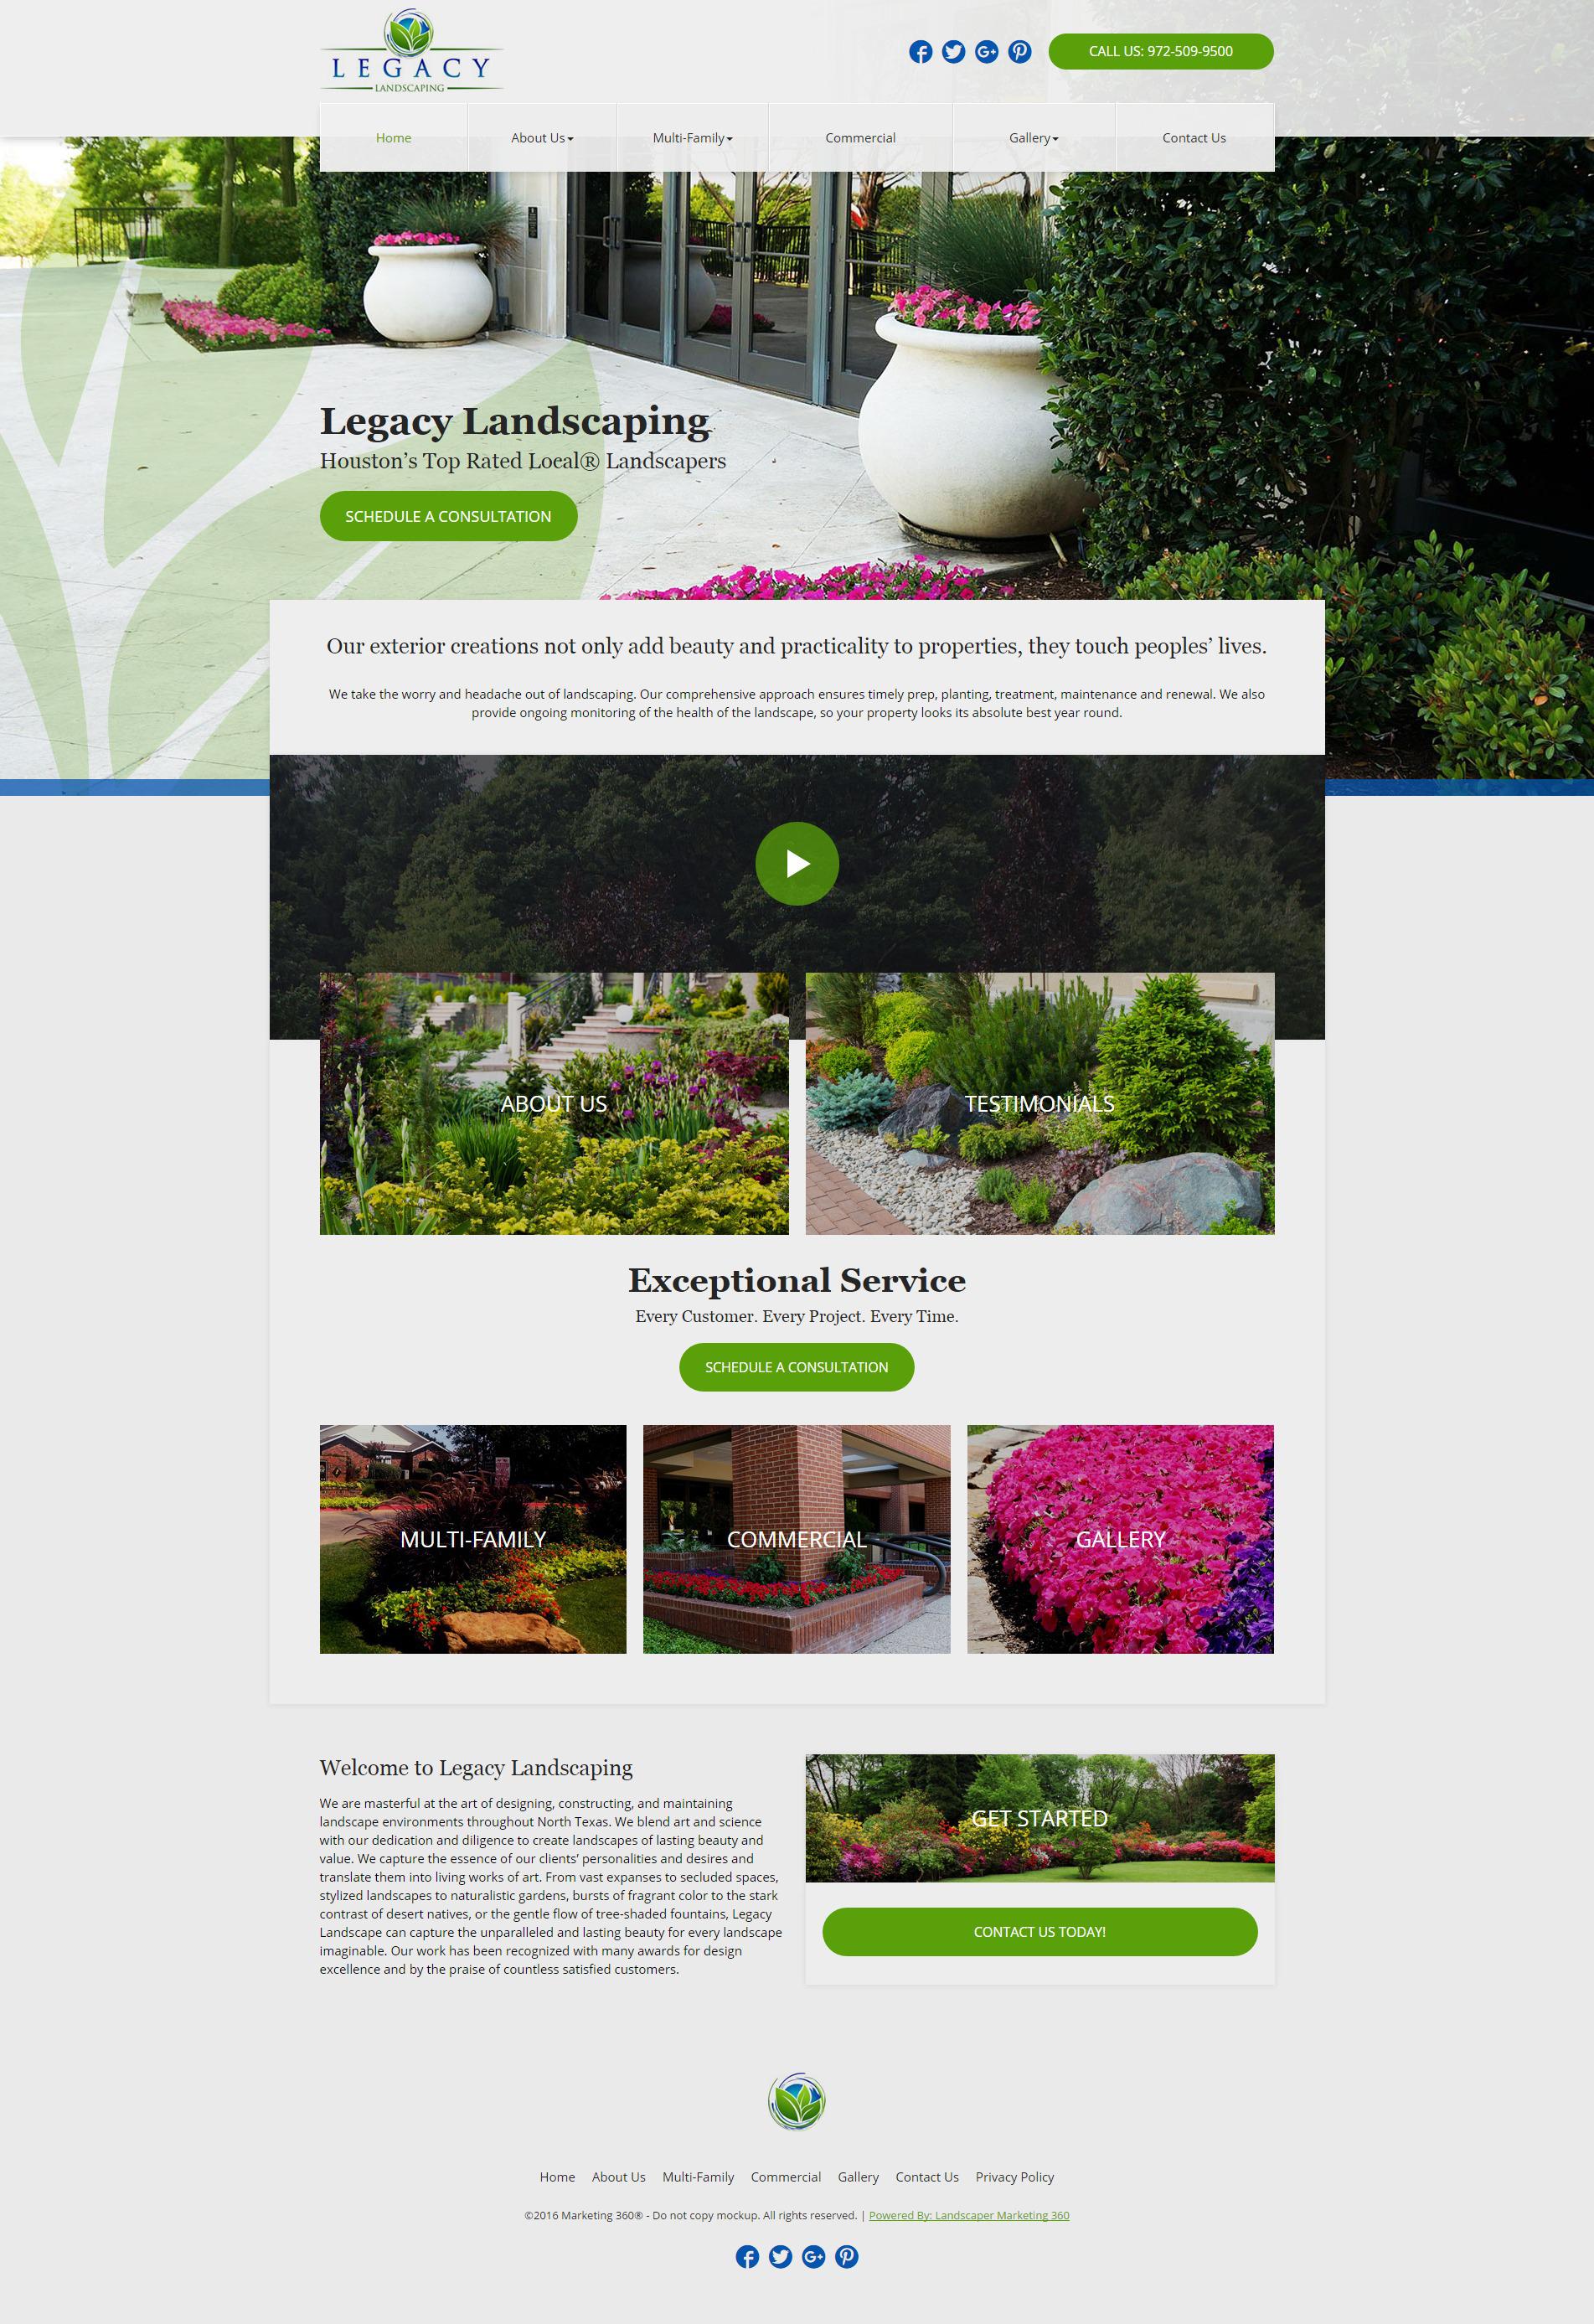 8 Landscaper Marketing Ideas Tips Strategies That Will Grow